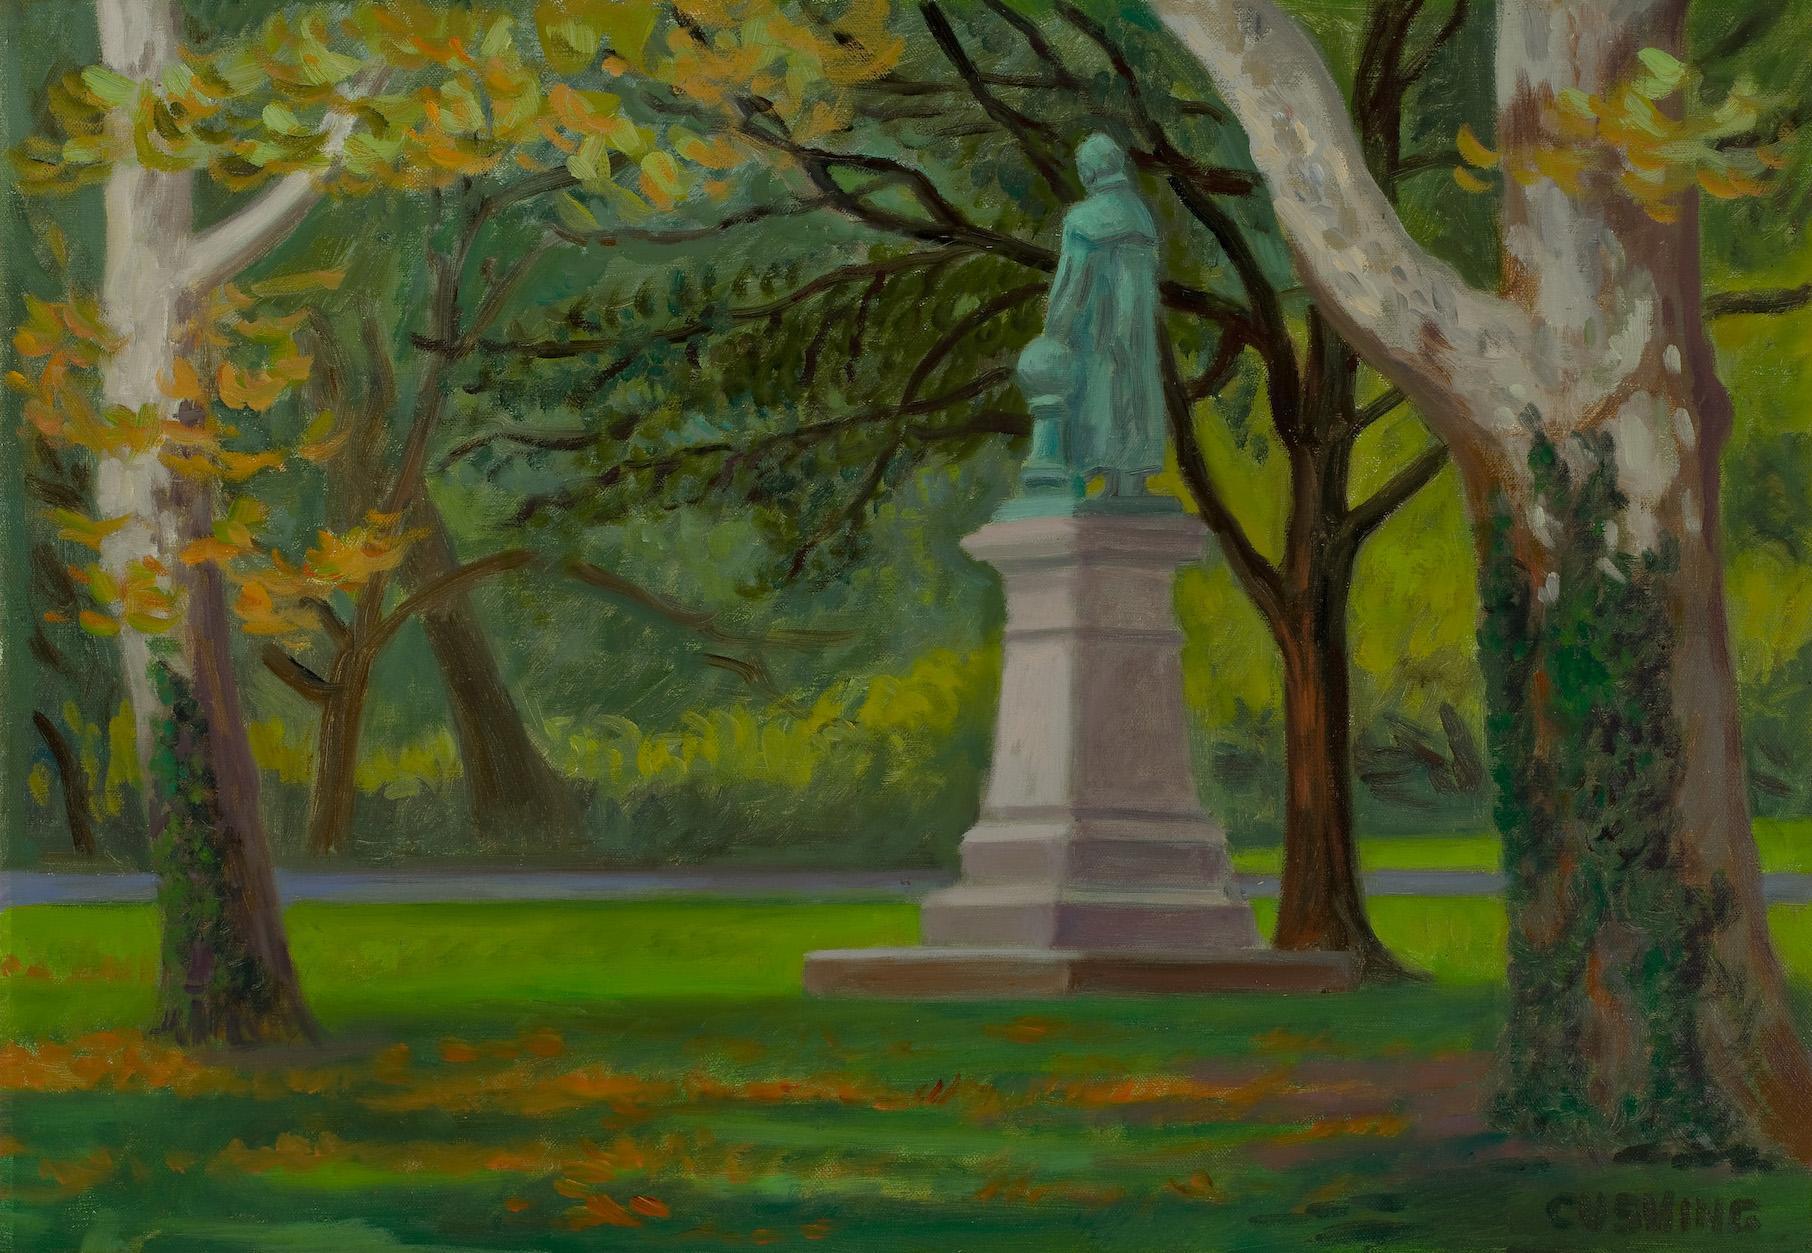 """Humboldt Statue, Fairmount Park""  16 x 20"" (sold)"